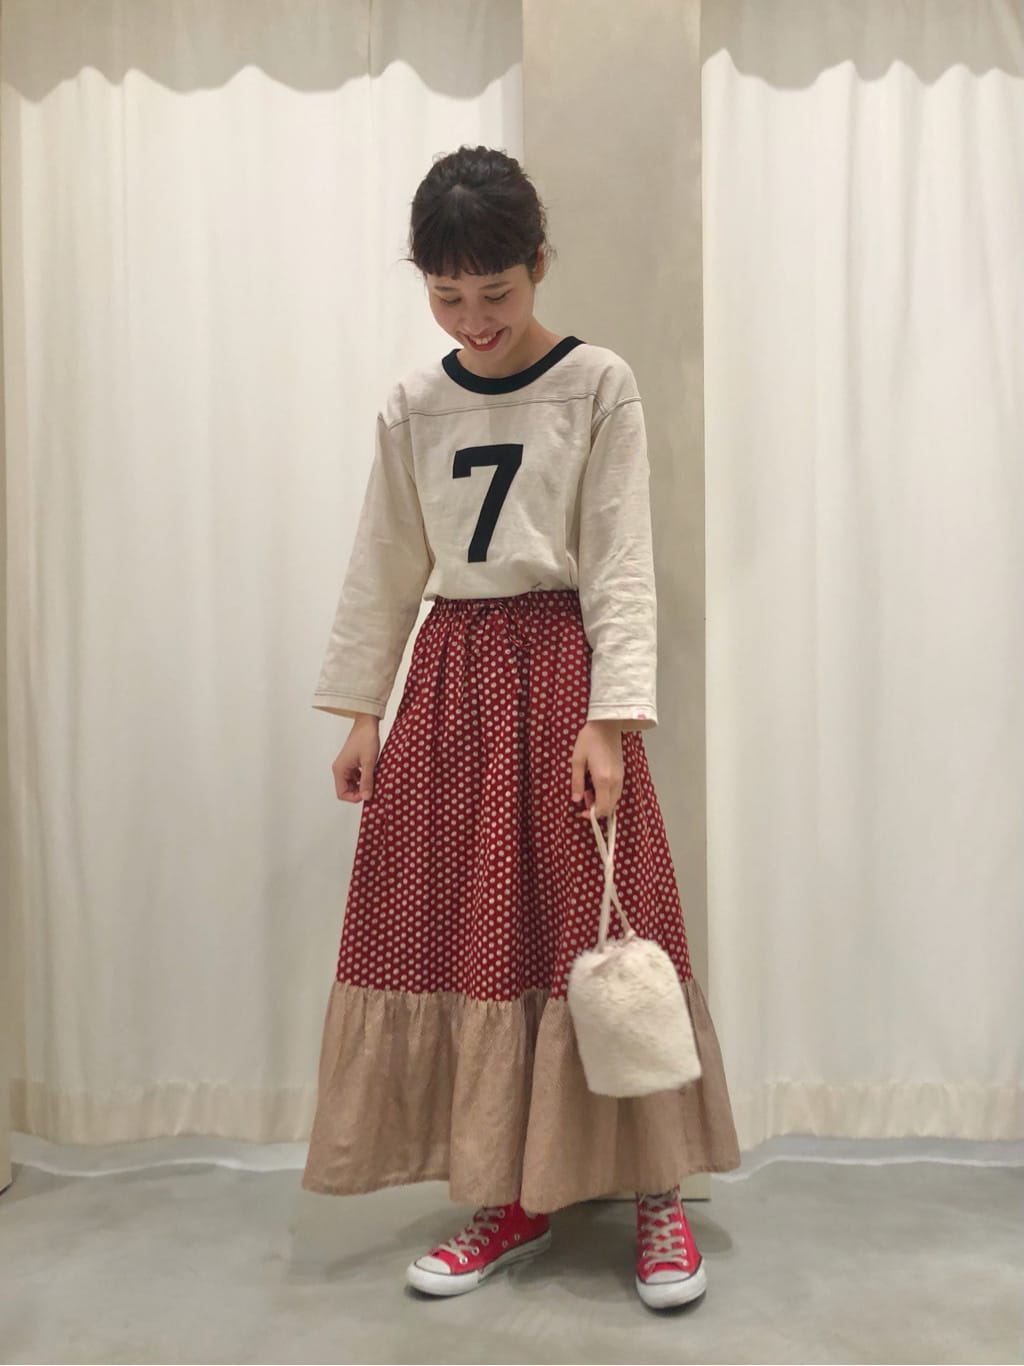 CHILD WOMAN , PAR ICI 東京スカイツリータウン・ソラマチ 2021.09.14